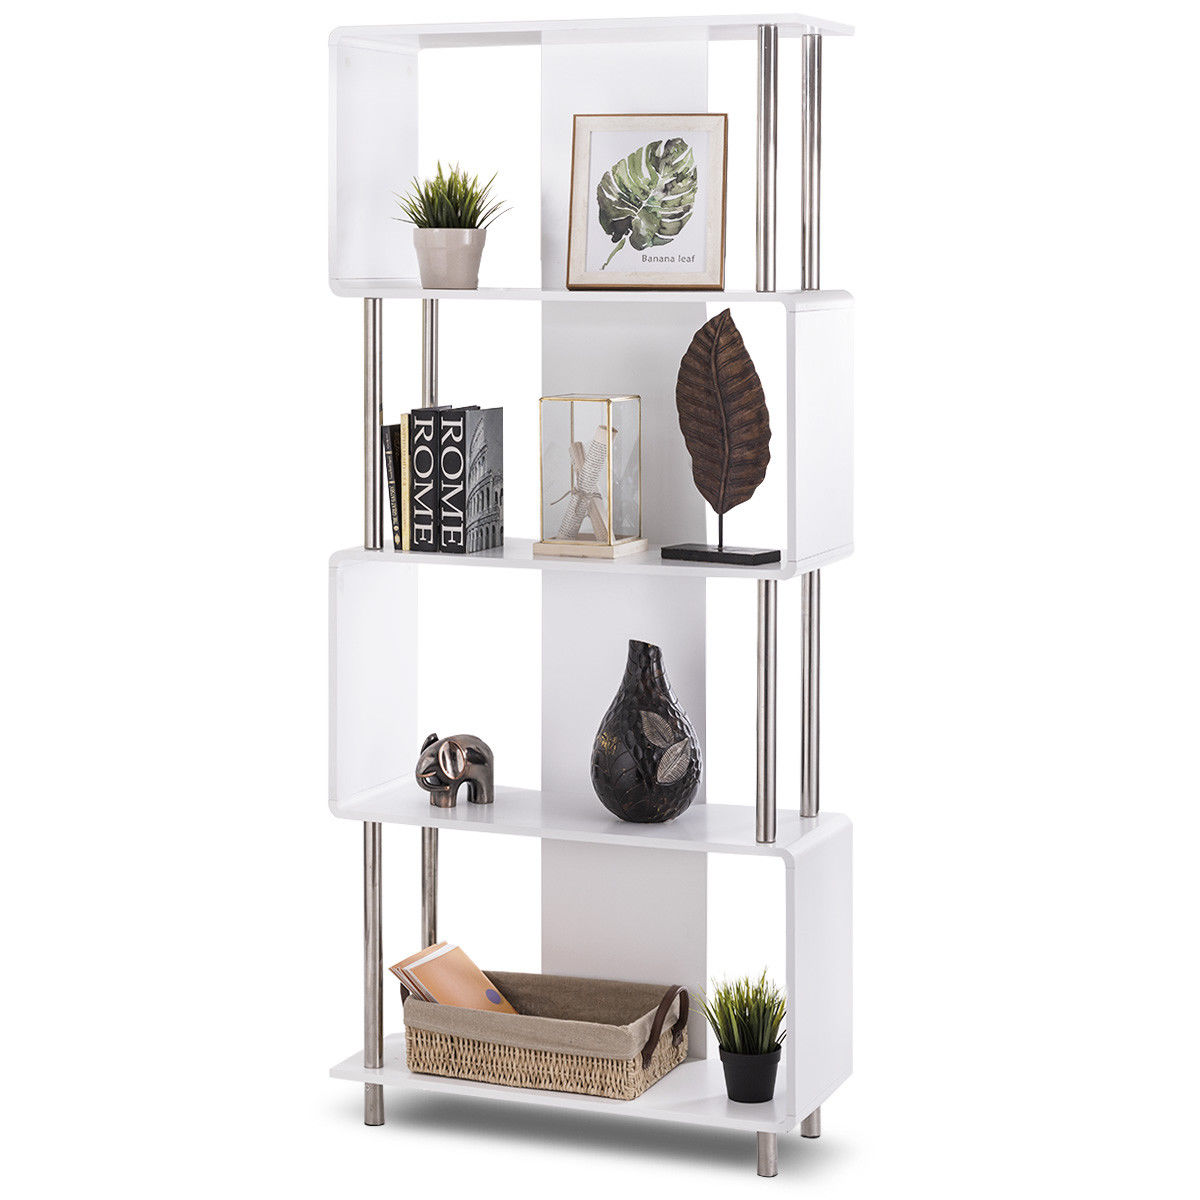 danish ideas teak modern freestanding in bookshelf decor photo stock bookcase